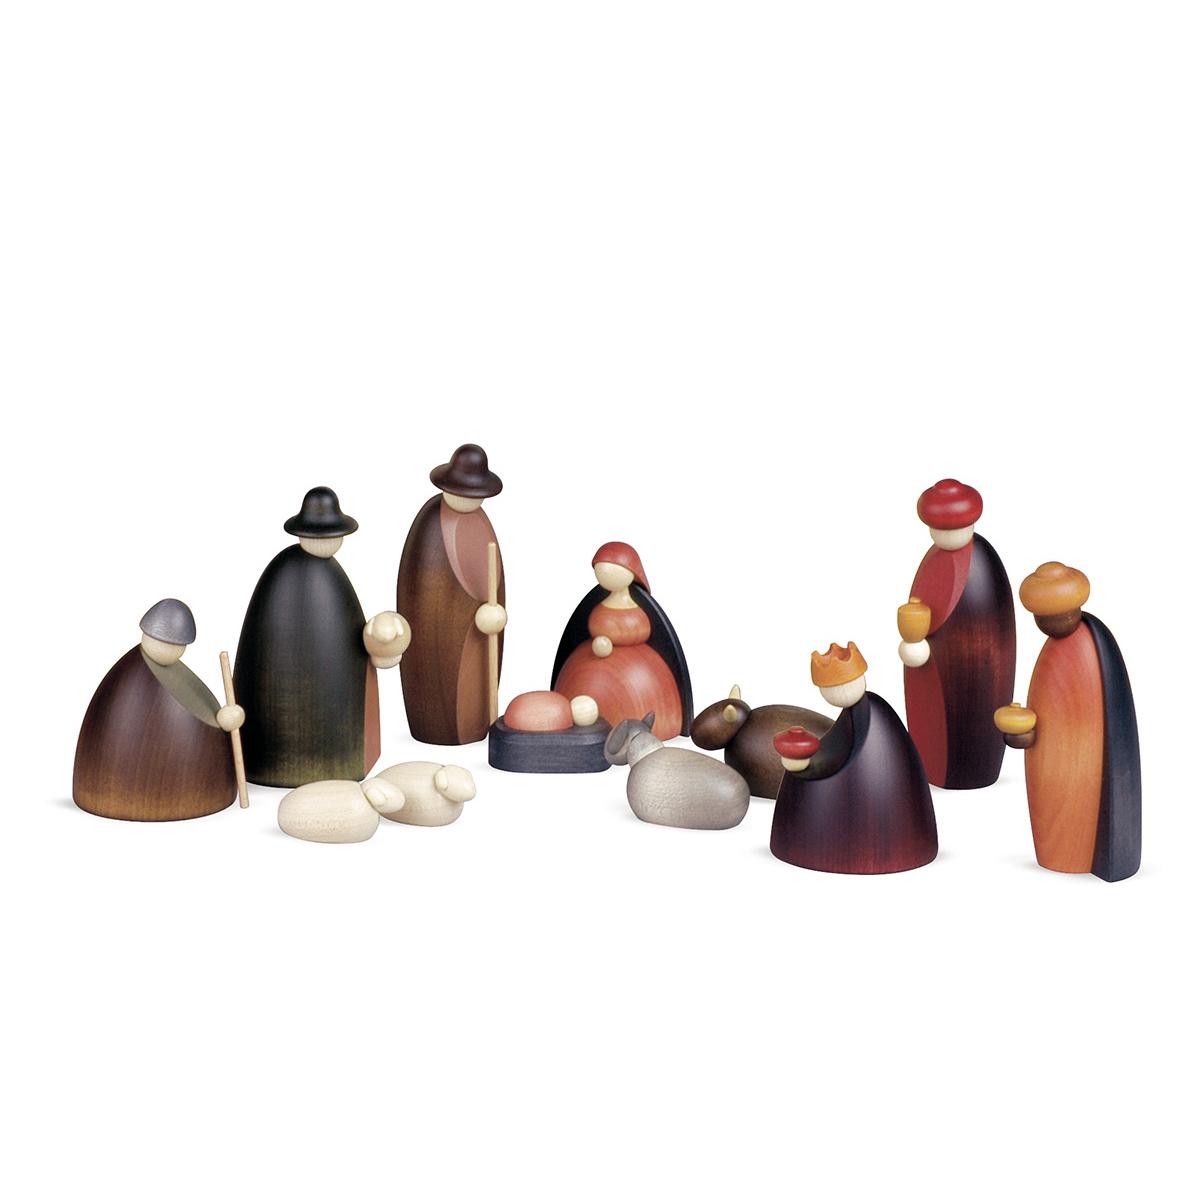 Weihnachtskrippe Krippenfiguren, 12-teilig